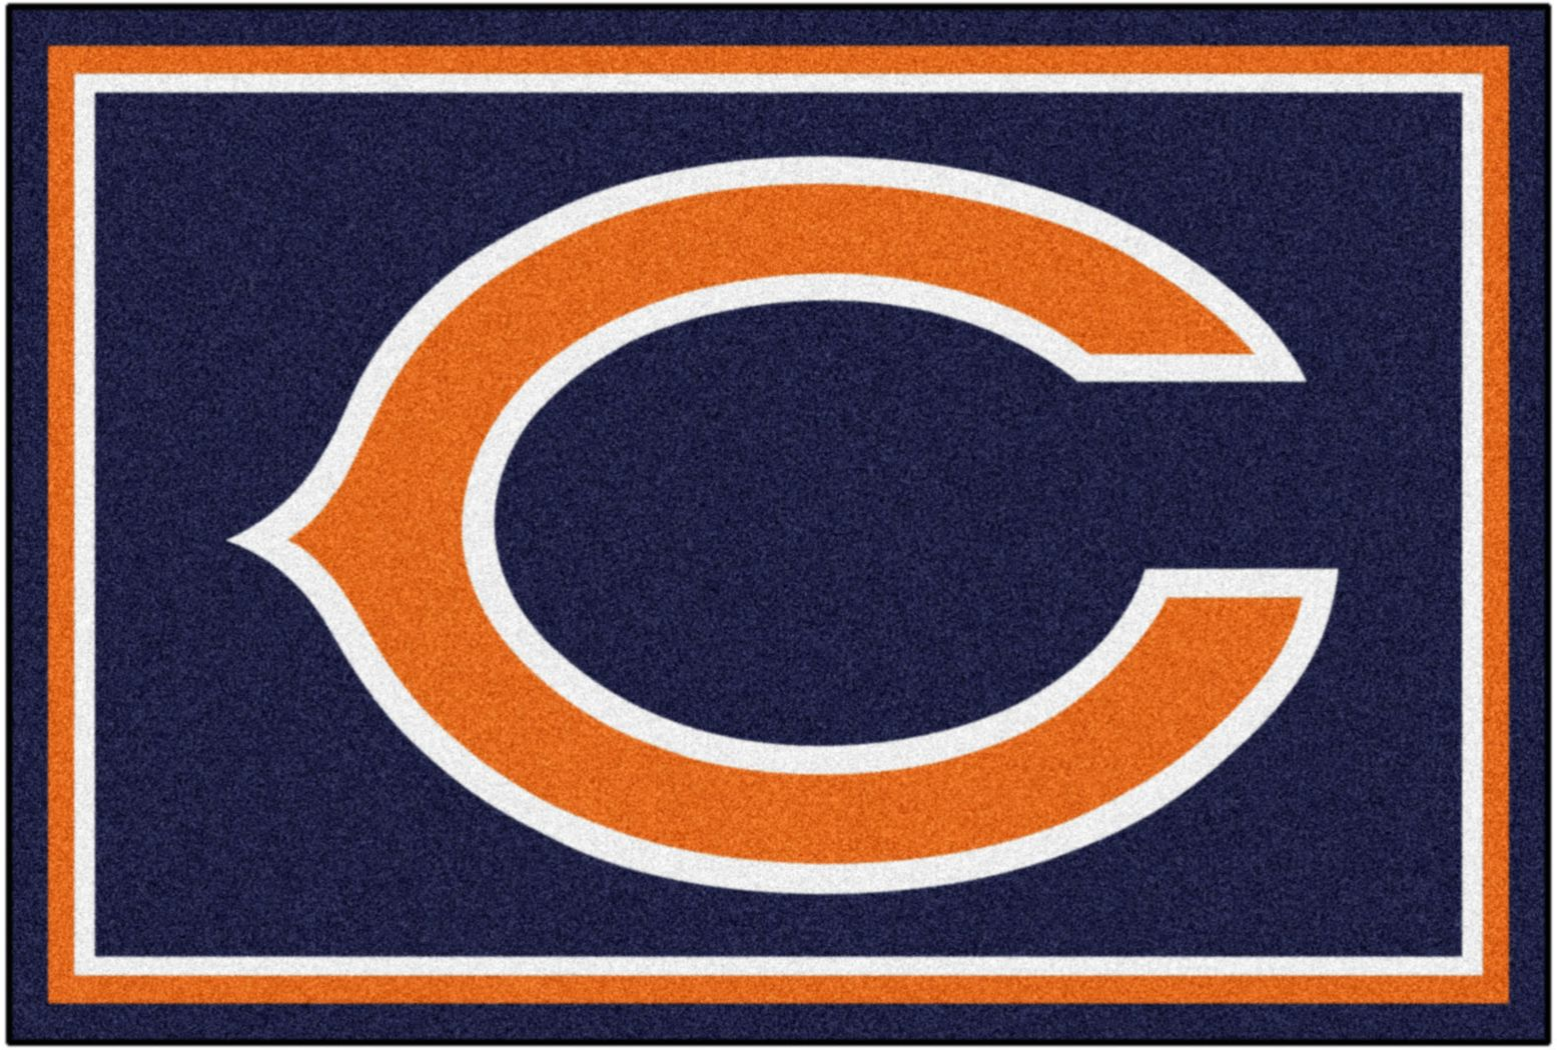 NFL Big Game Chicago Bears 5' x 8' Rug